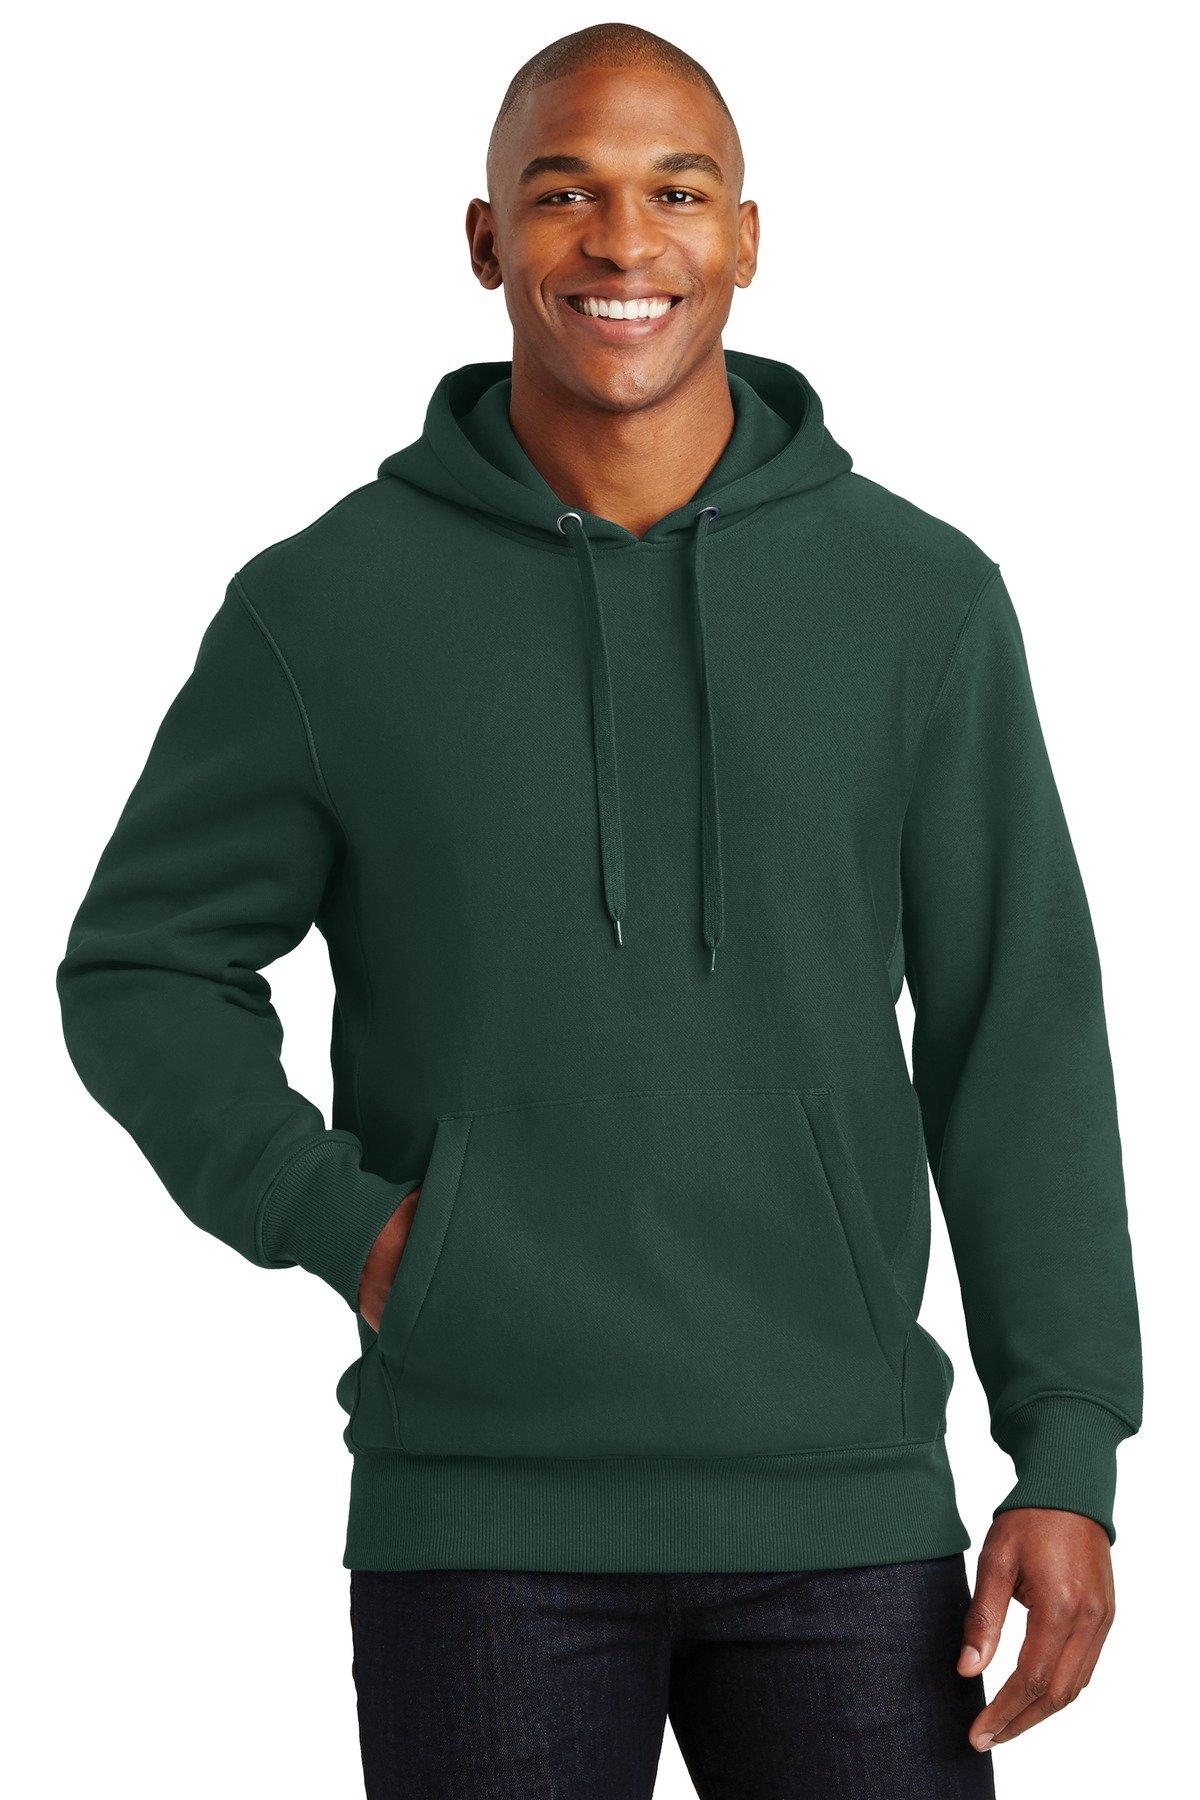 SportTek Super Heavyweight Pullover Hooded Sweatshirt